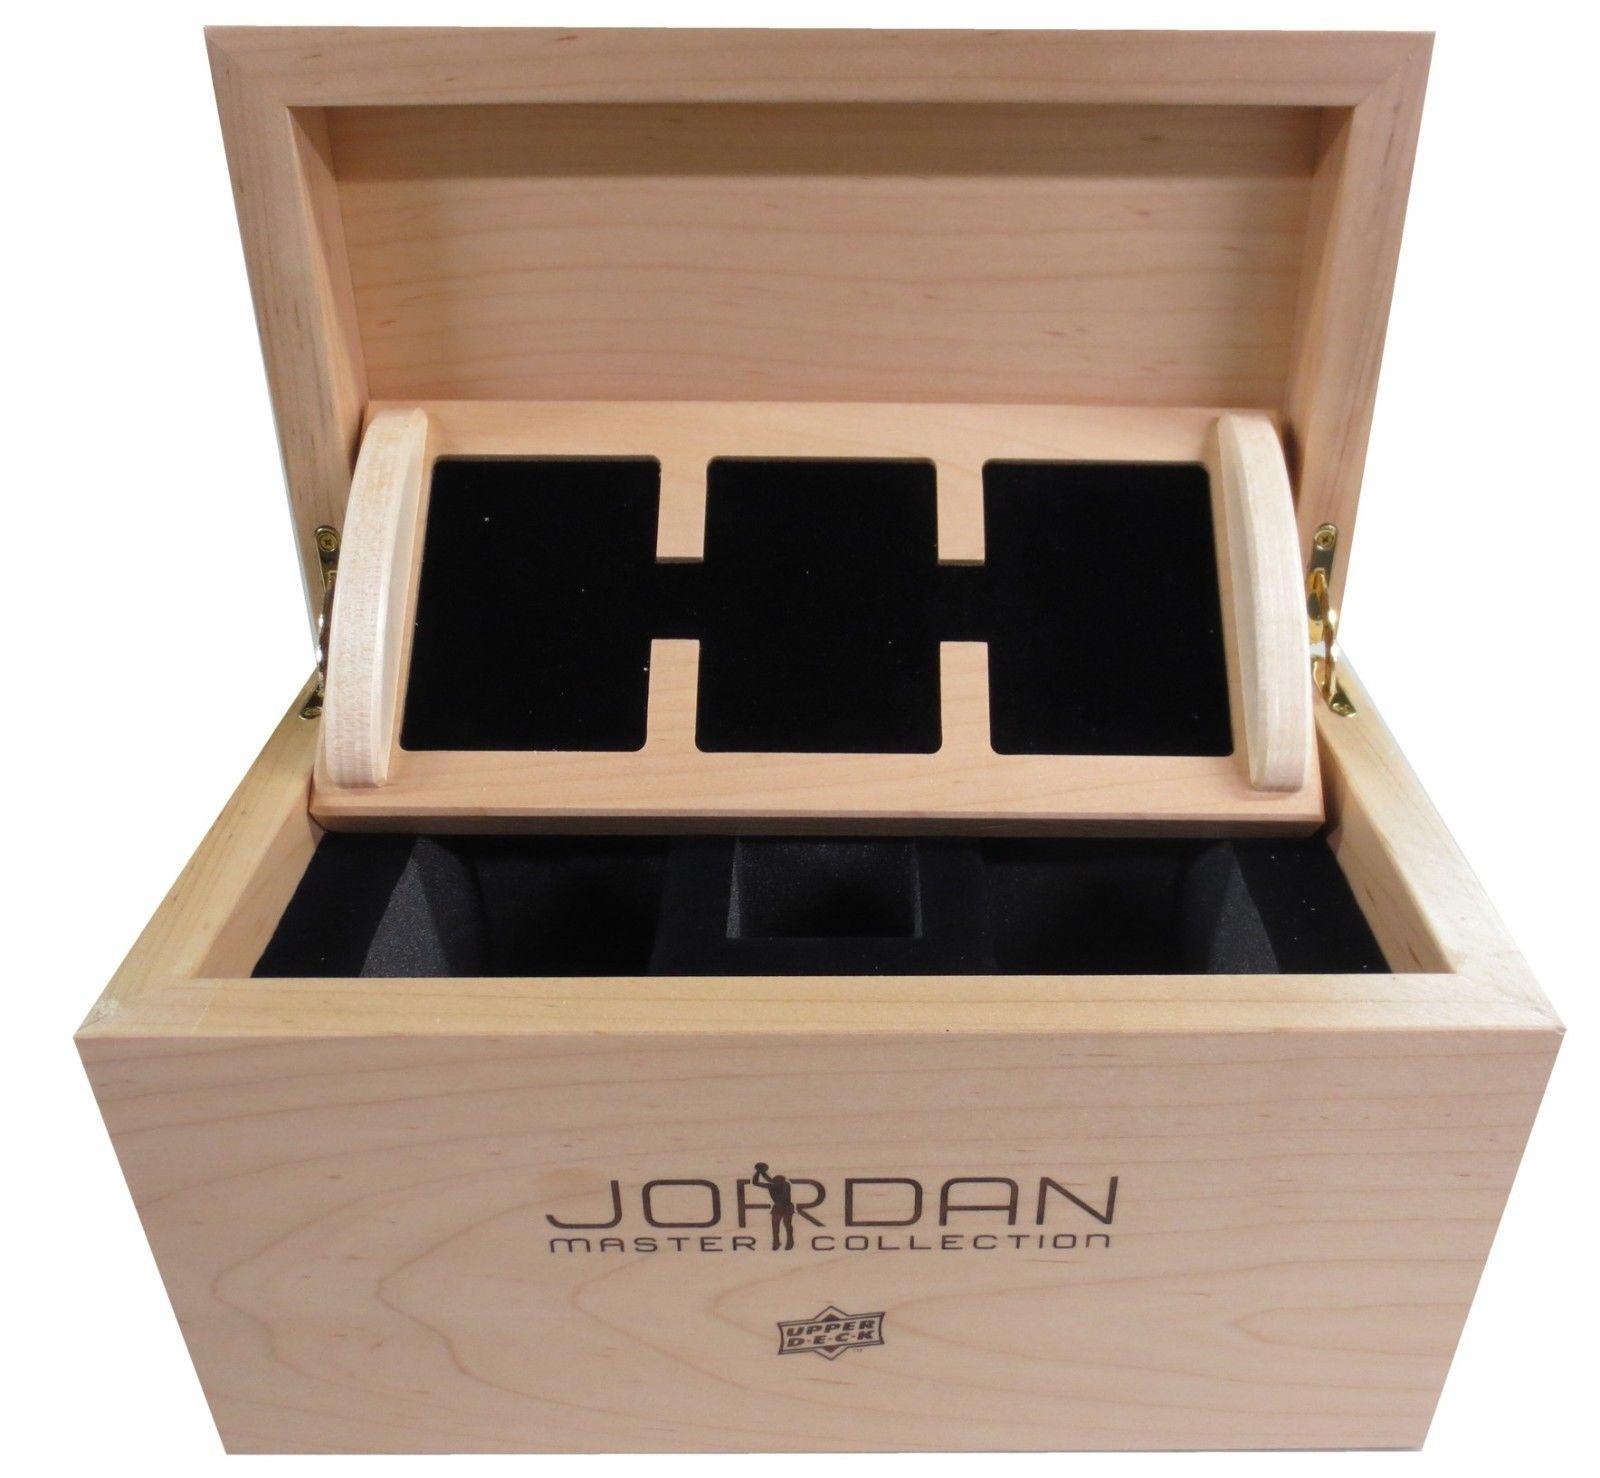 jordan-upper-deck-master-collection-2